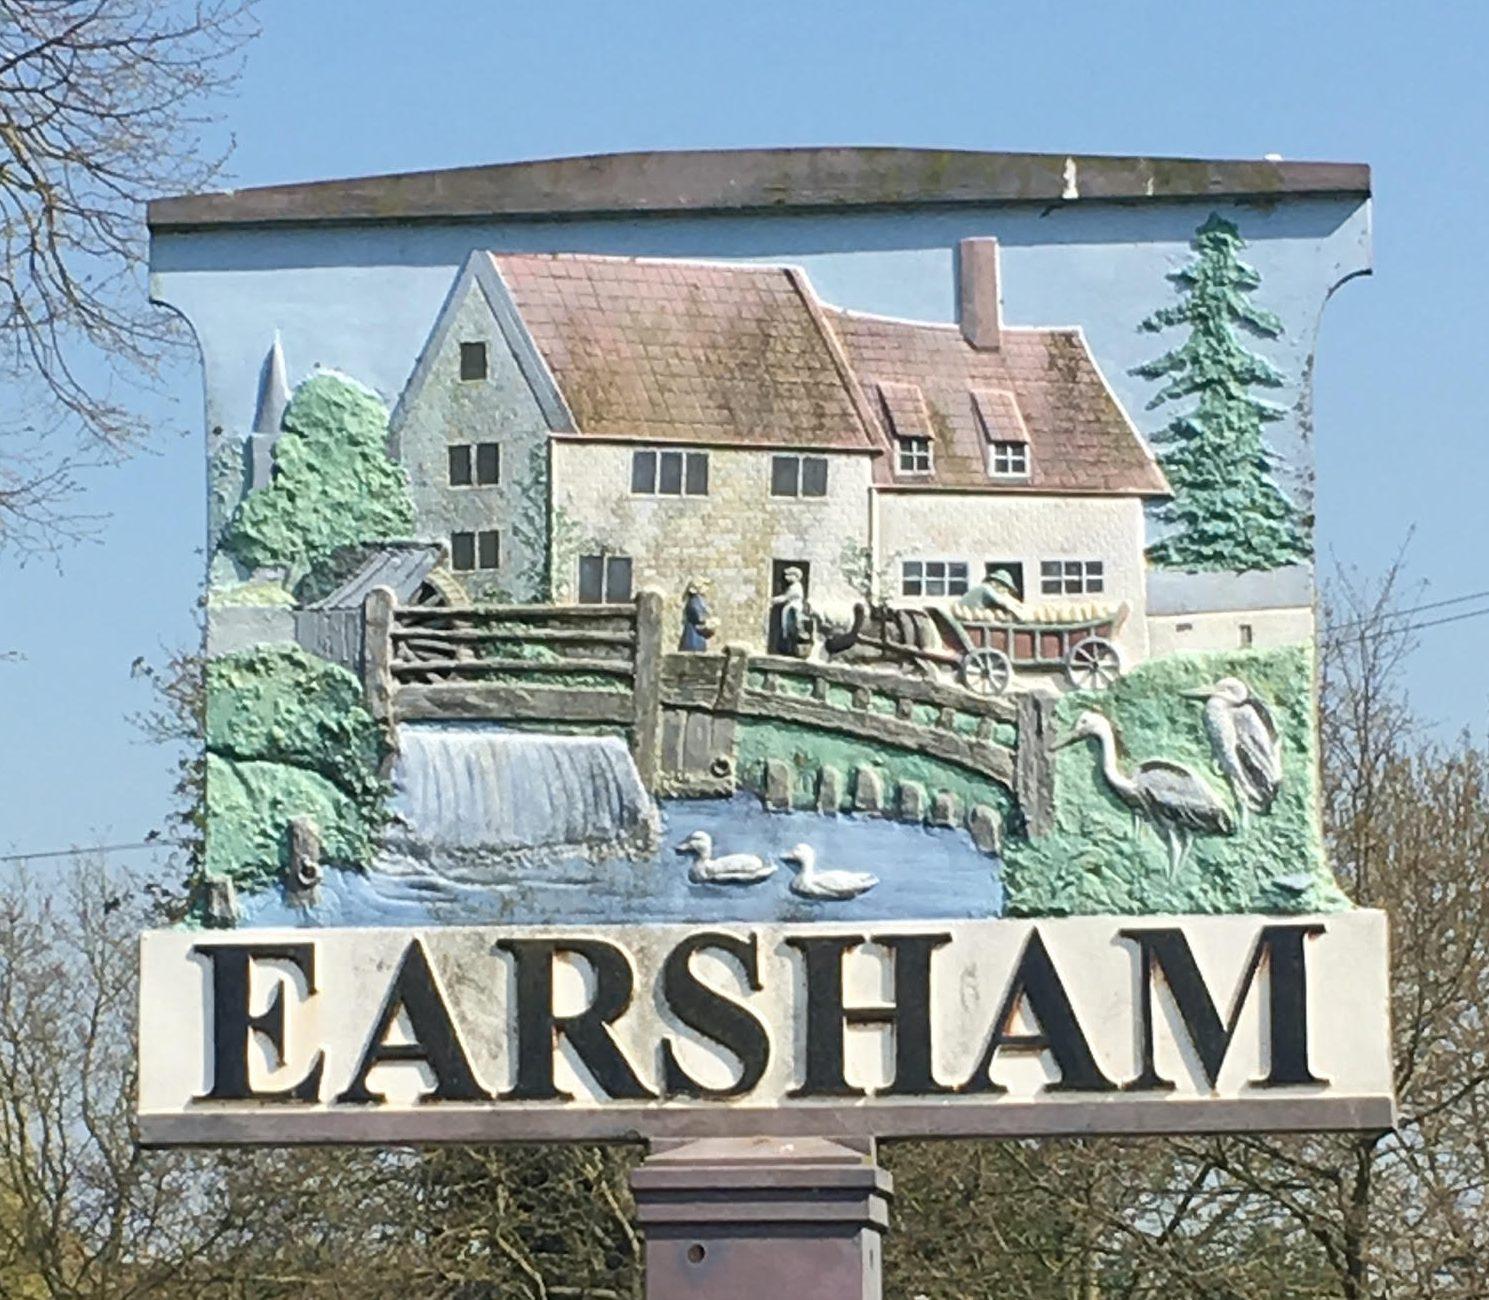 Earsham